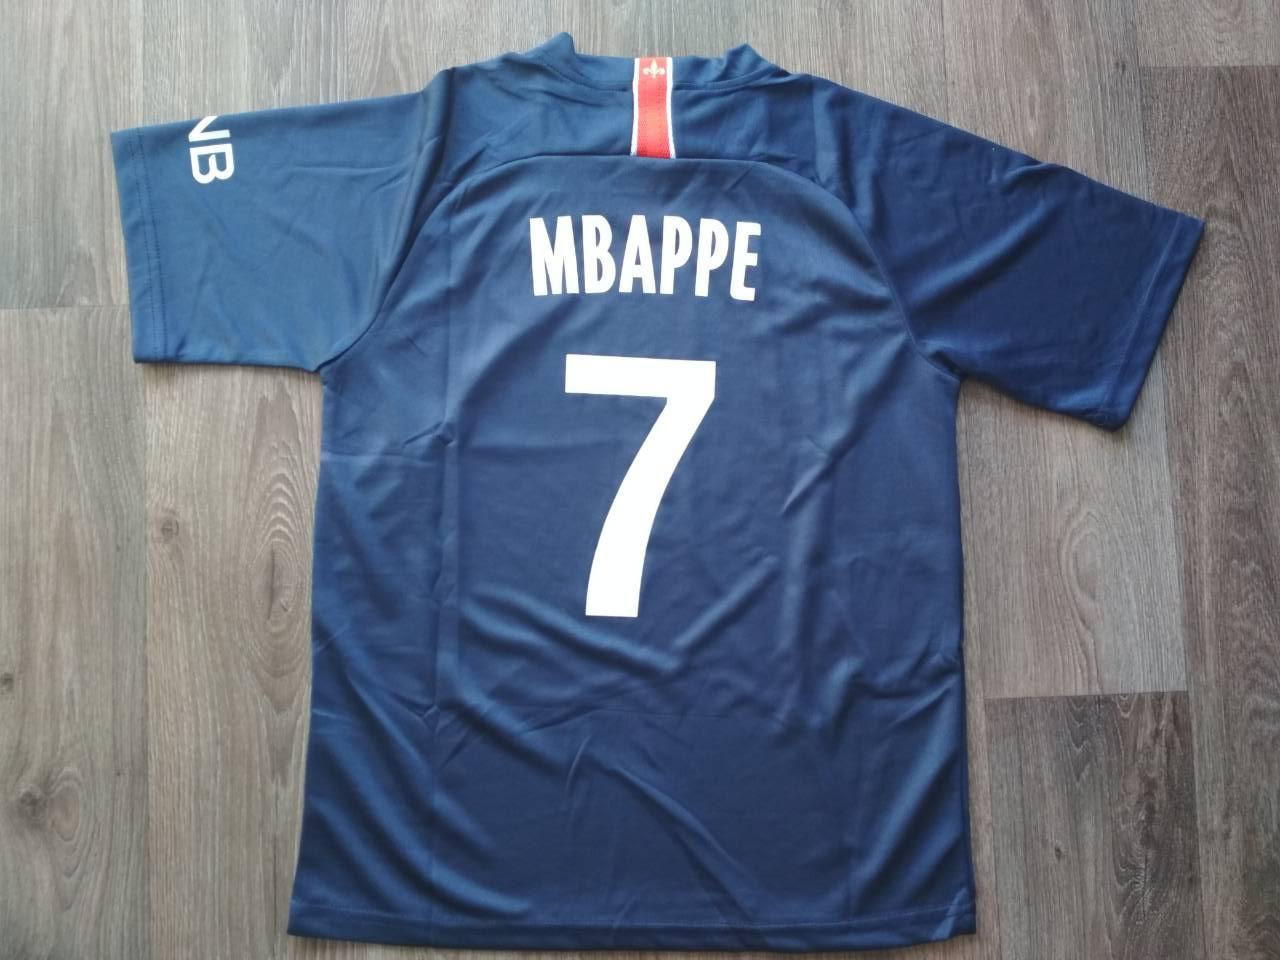 Футбольная форма ПСЖ Mbappe (Мбаппе) сезон 2018-2019 синяя